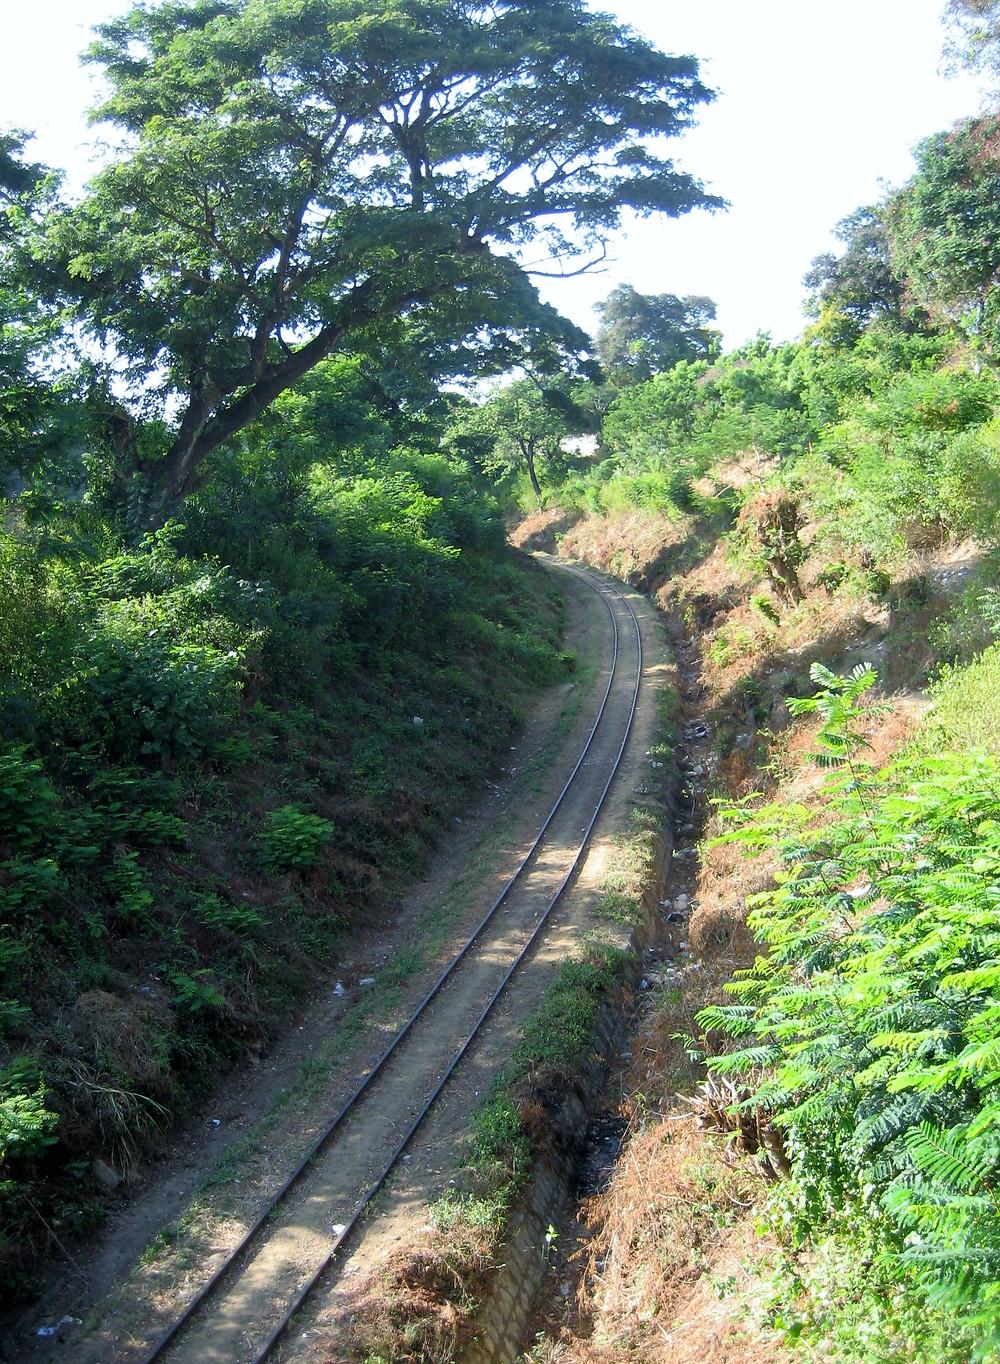 The Railway Cutting